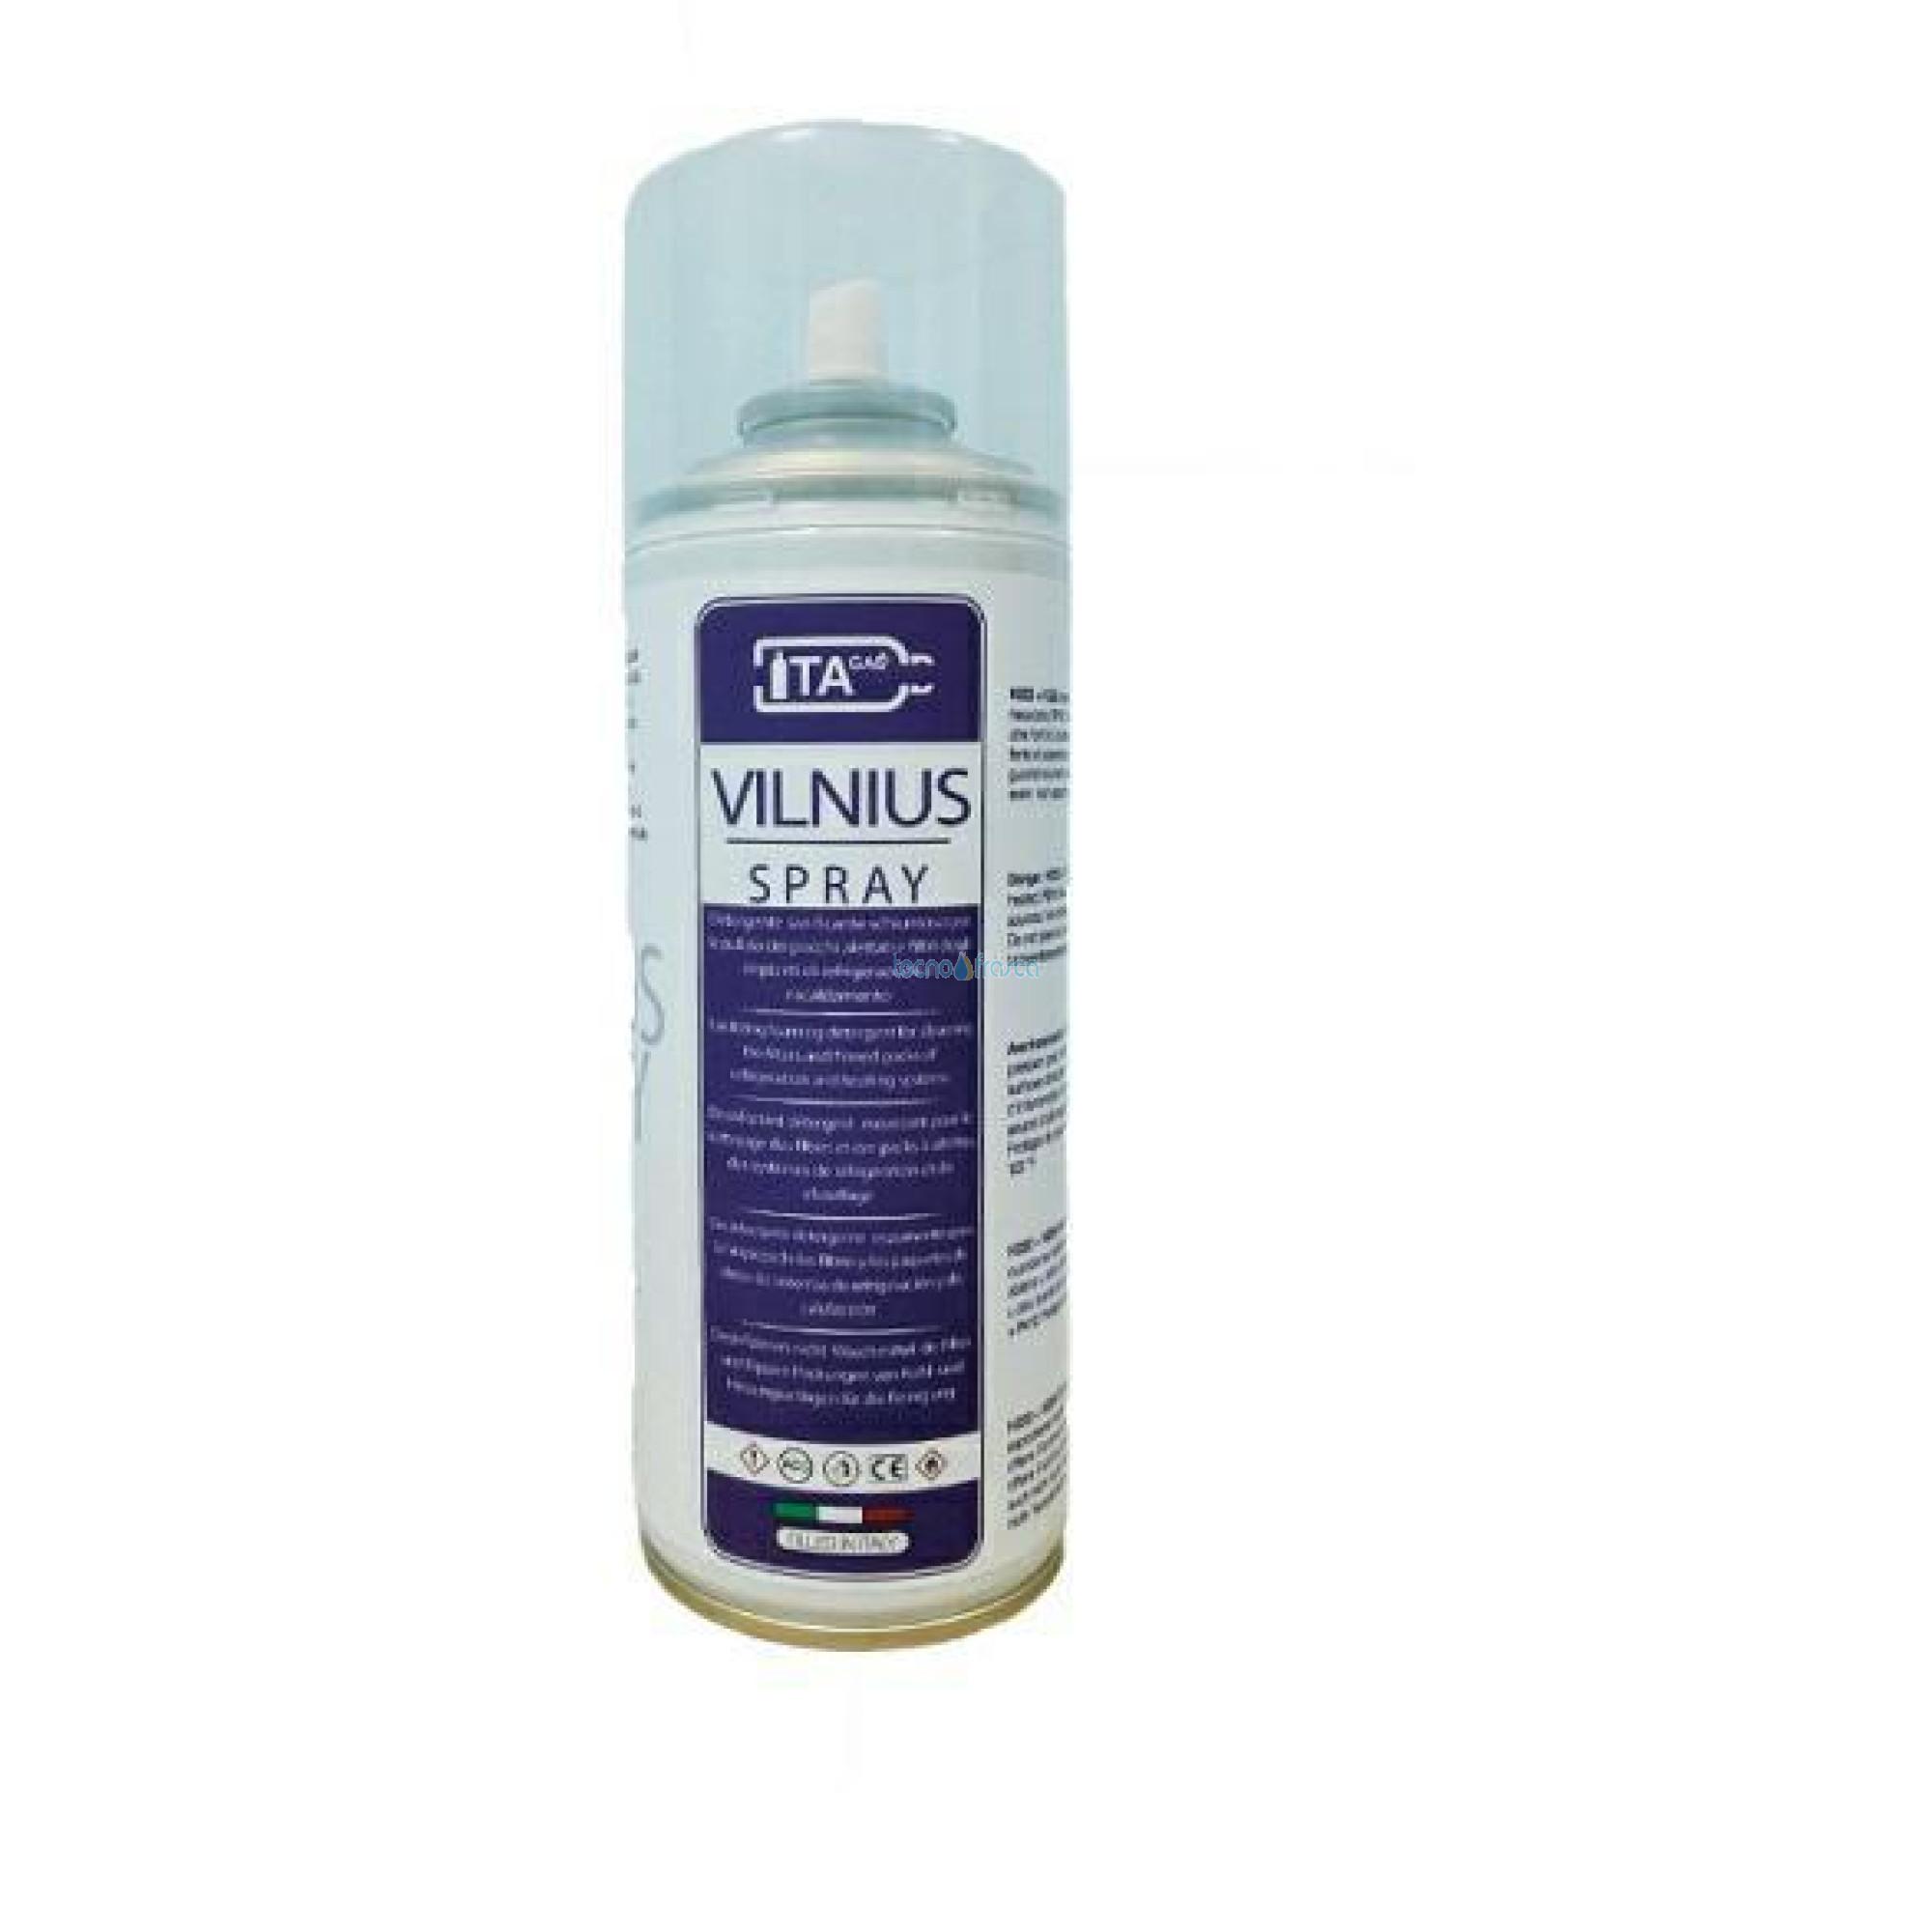 Detergente spray schiumoso vilnius 400ml vl80201